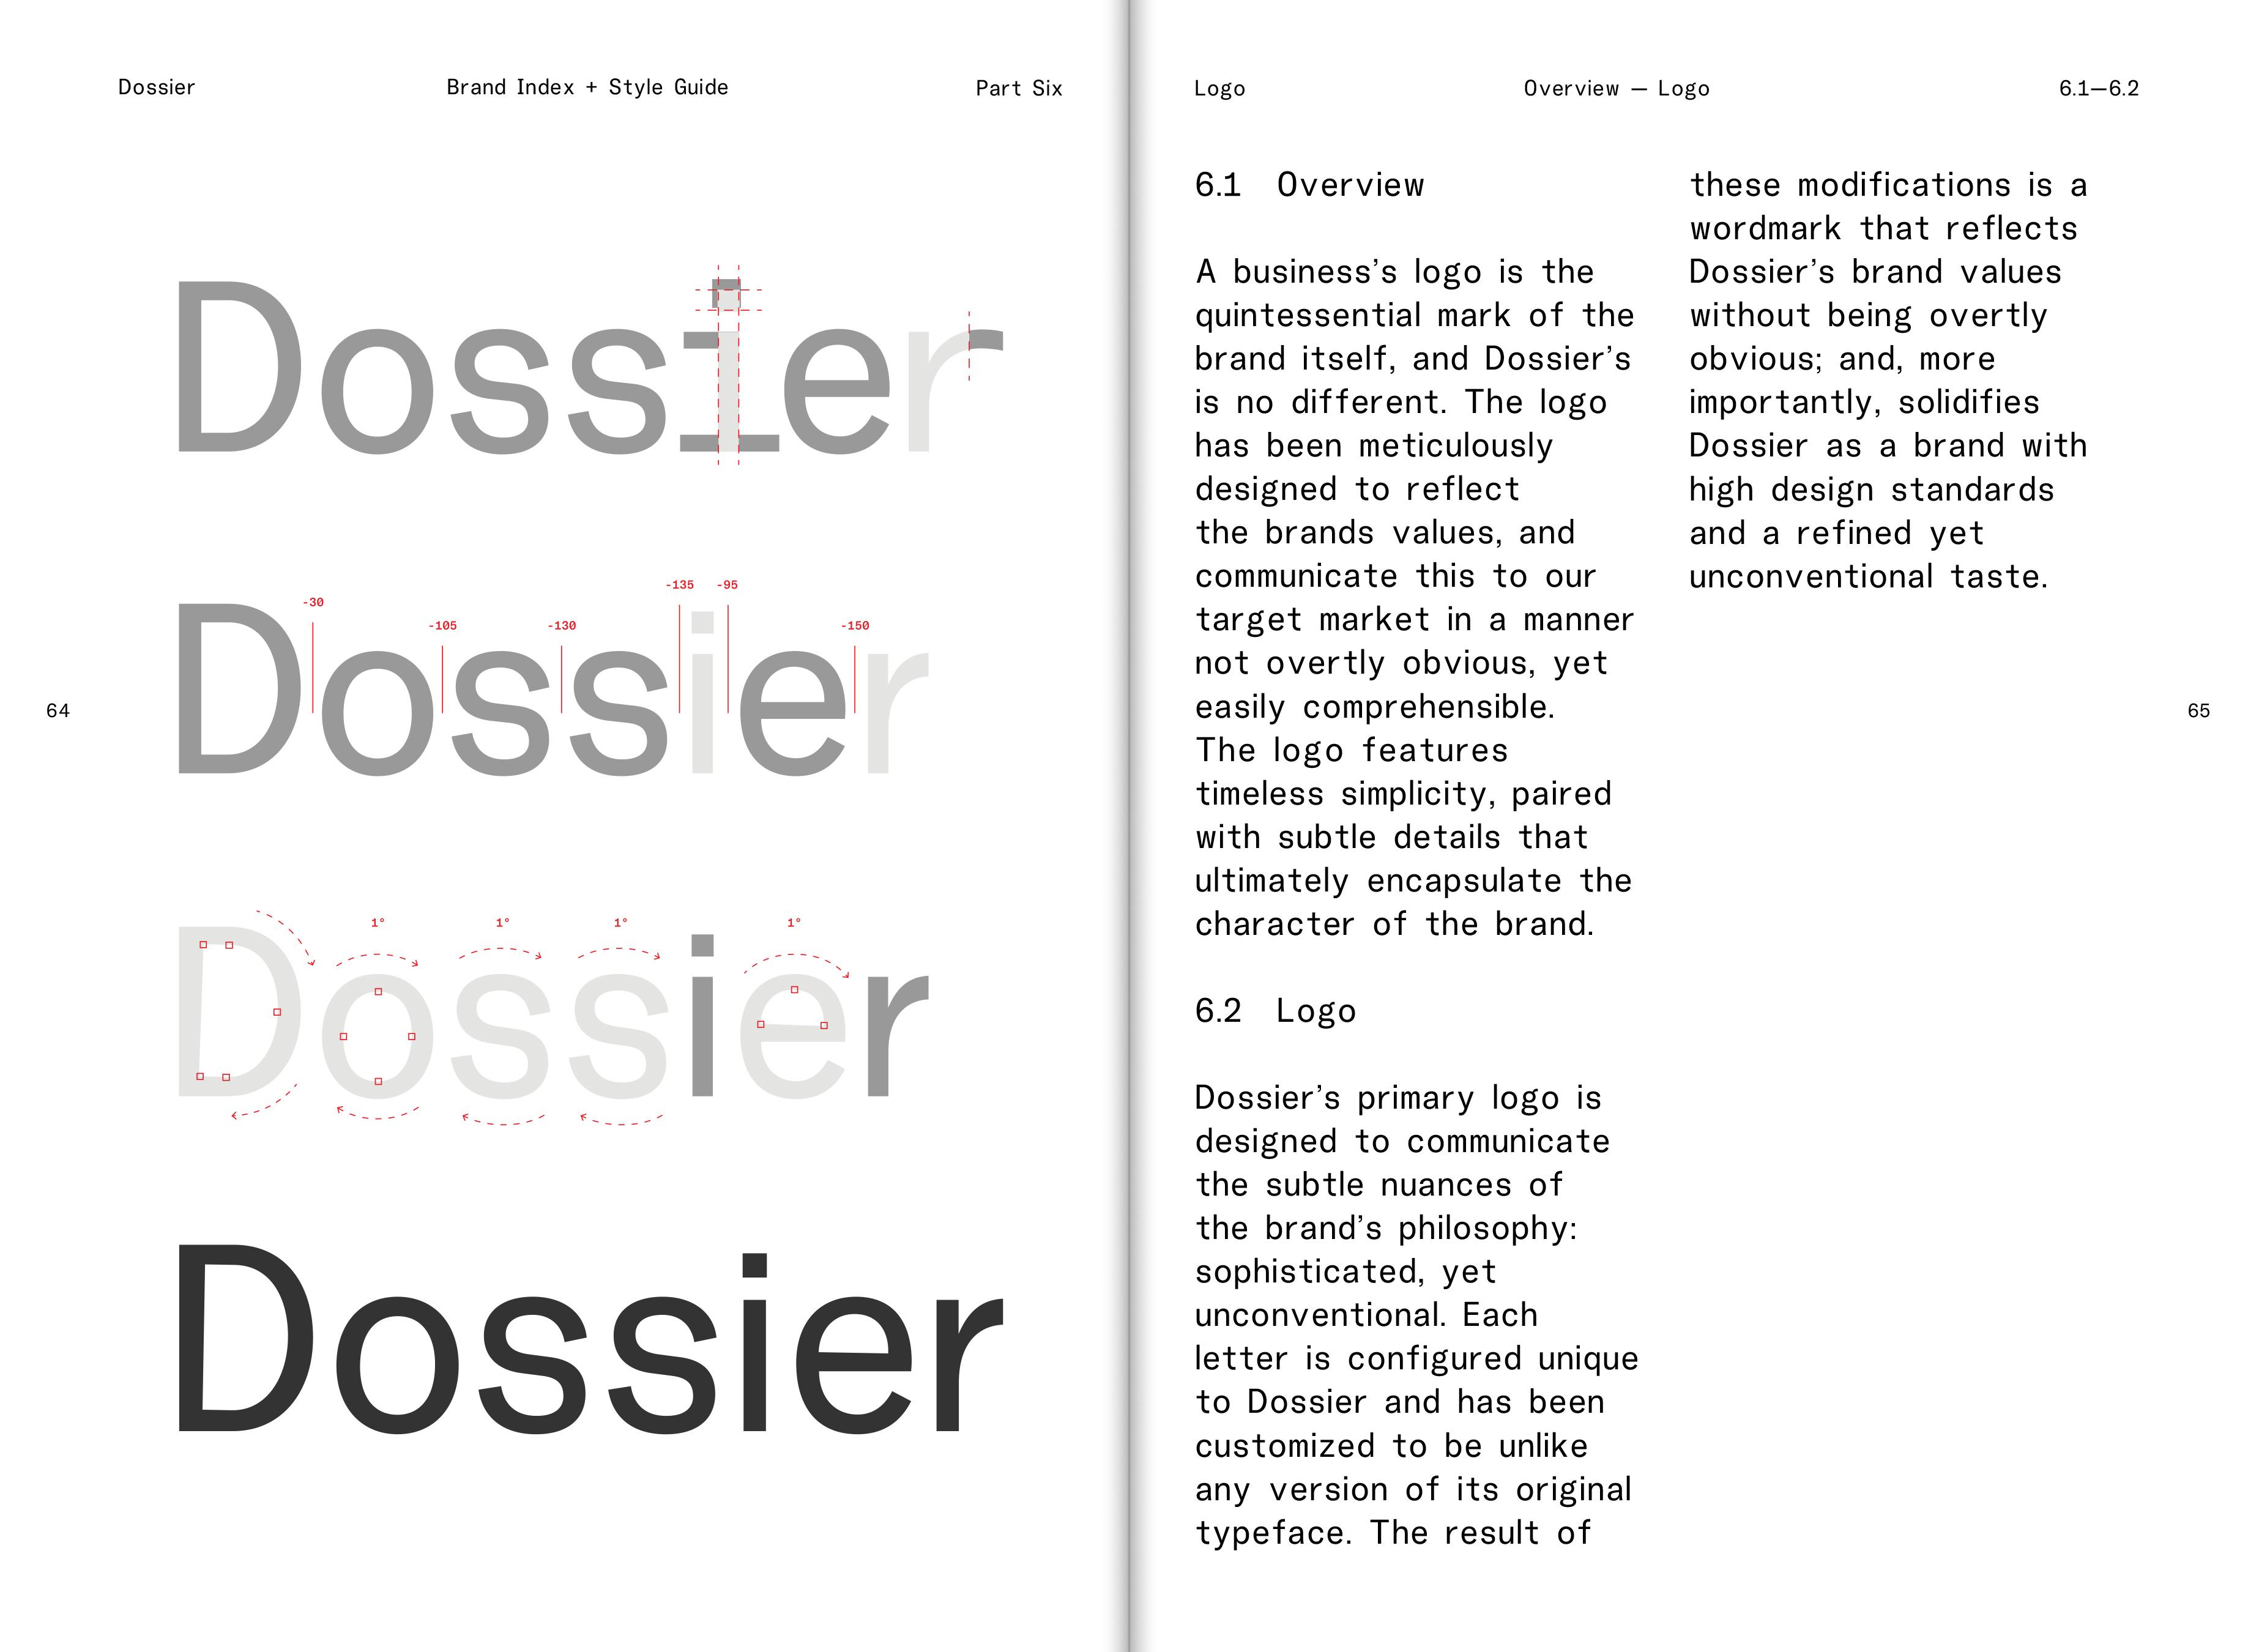 Dossier Brand Book